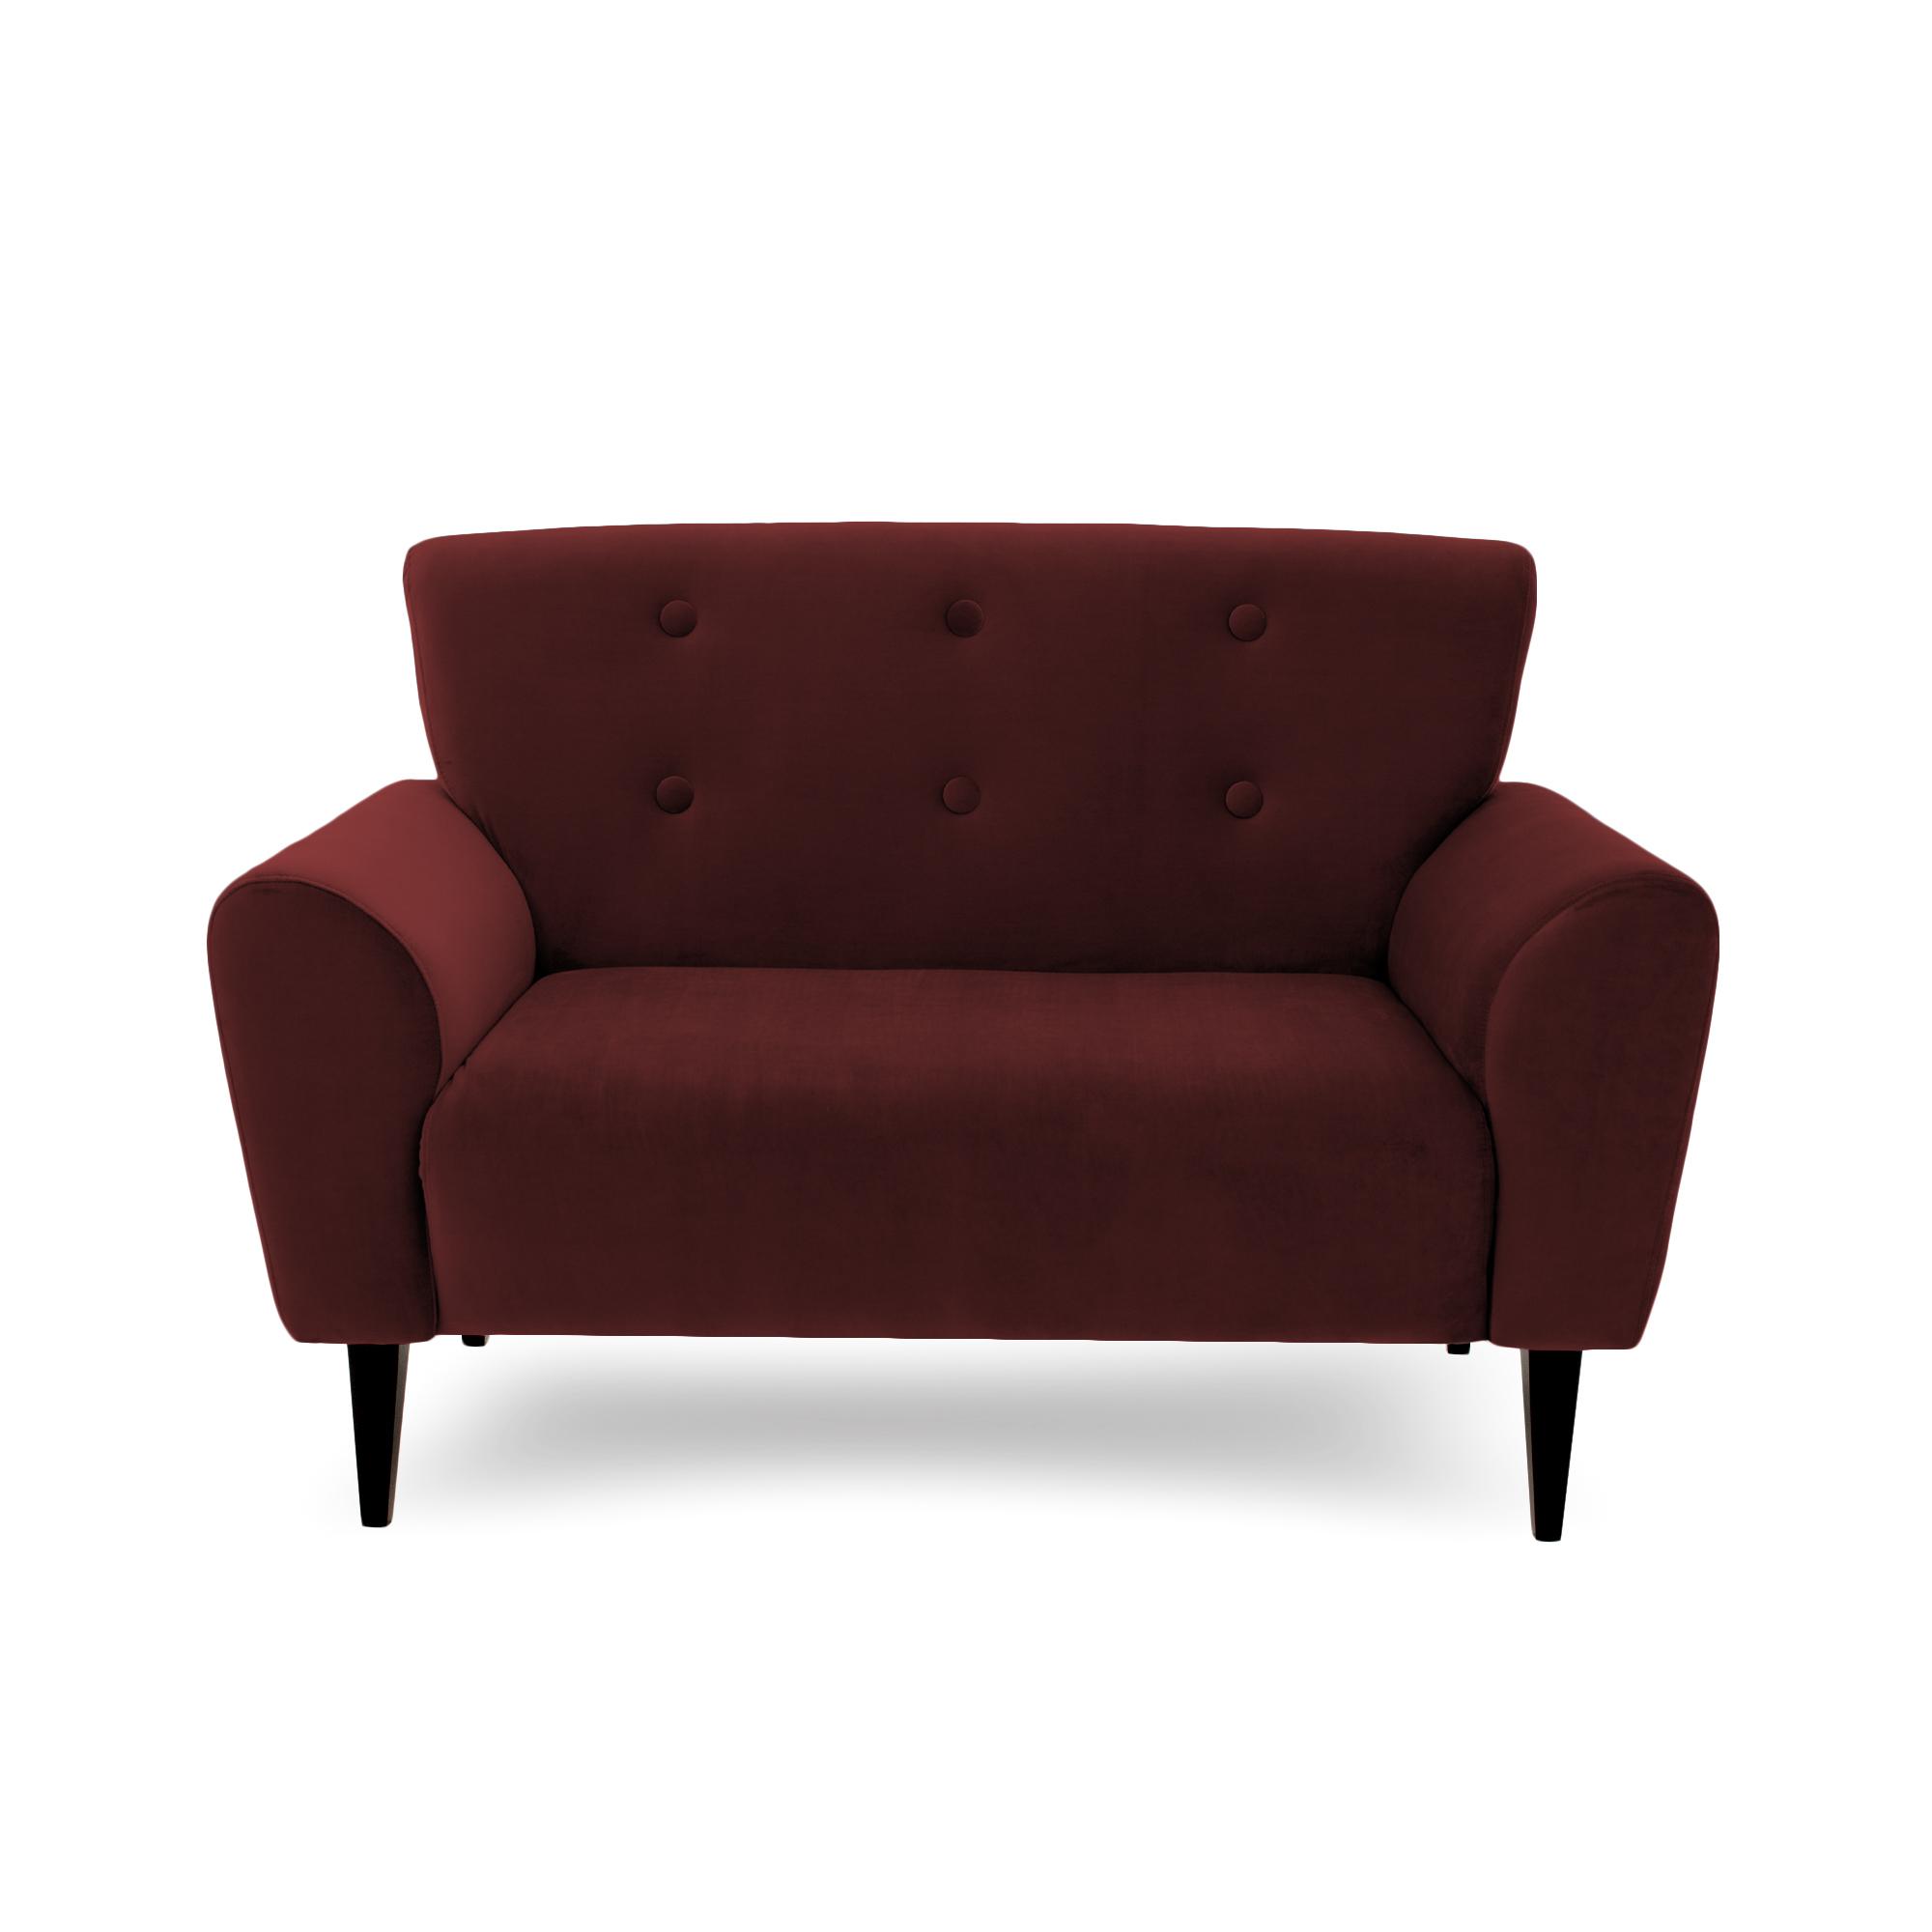 Canapea Fixa 2 locuri Kiara Burgundy Red